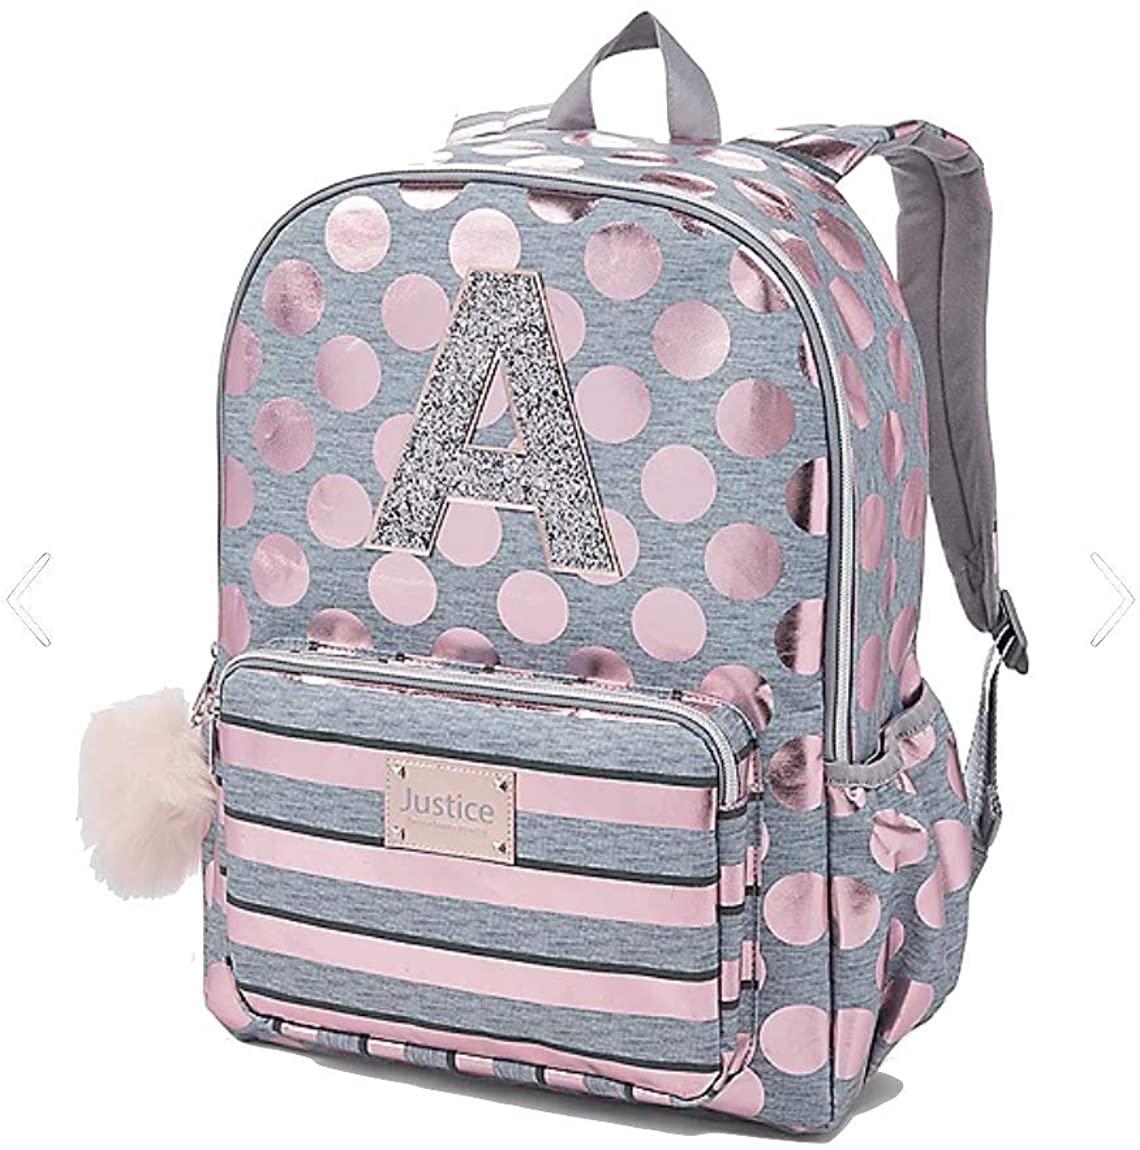 Justice Girls Rose Gold Foil Initial Backpack